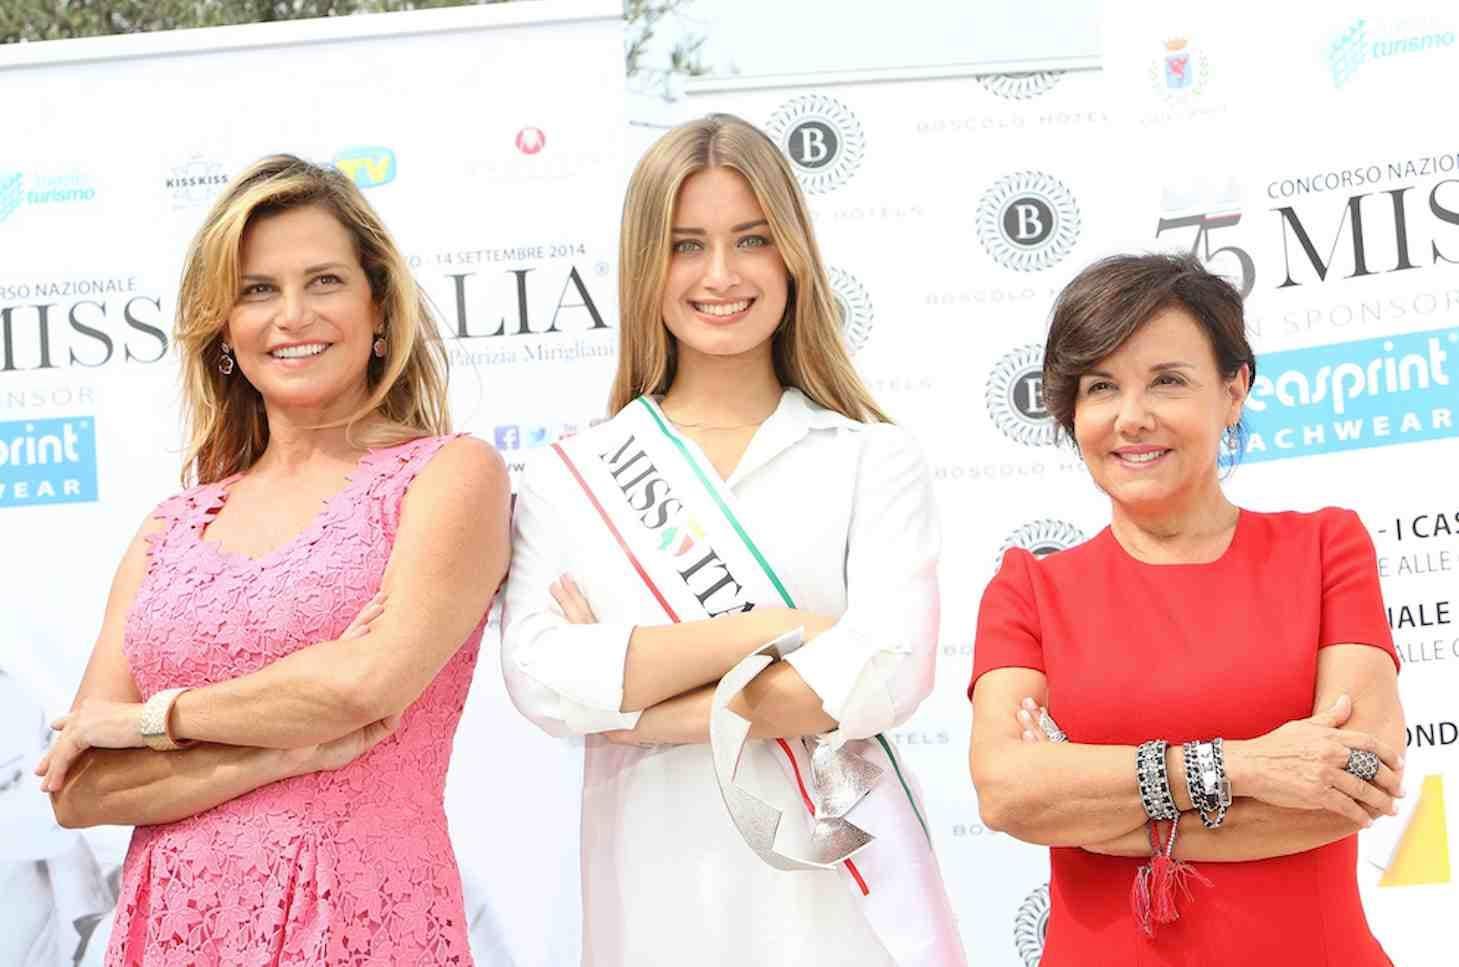 Miss Italia 2014 - Ventura - Arena - Mirigliani